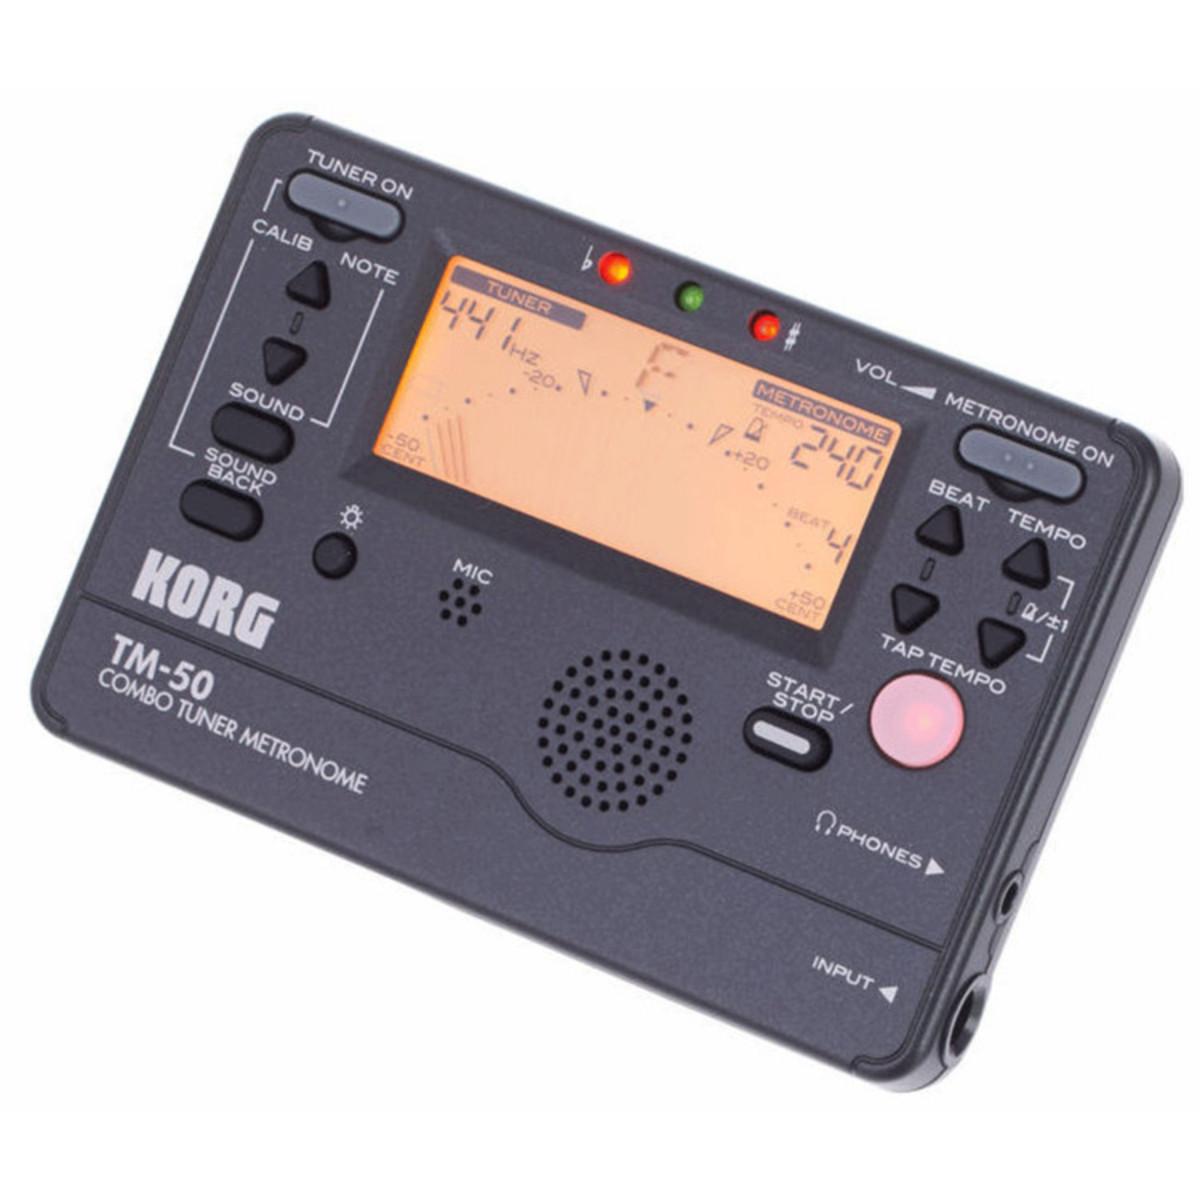 Korg Tm 50 : korg tm 50 tuner metronome black at gear4music ~ Russianpoet.info Haus und Dekorationen